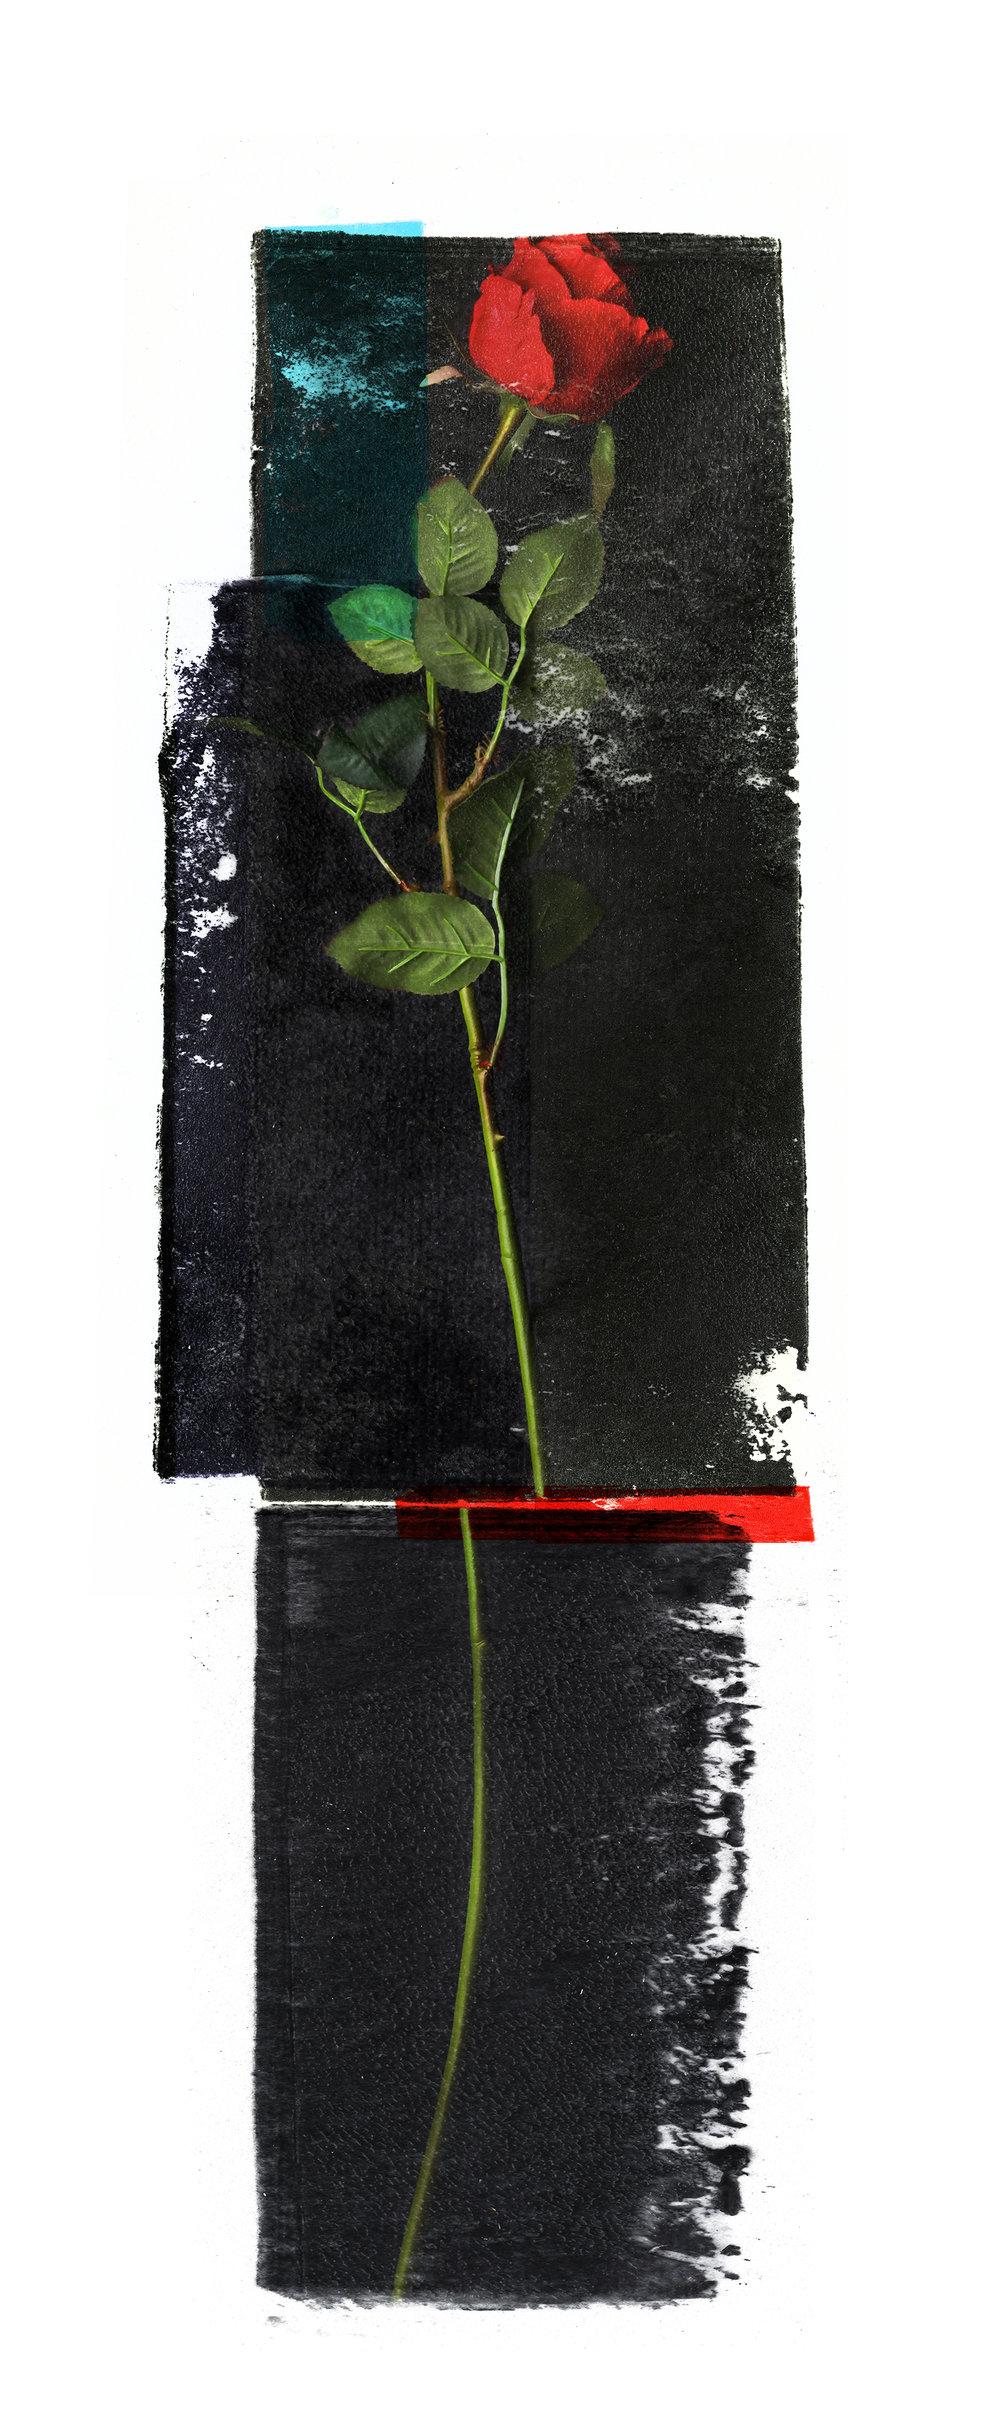 Cure ( Rose )  Original pigment print / BFK rives 250 gr 56 x 25 cm / 22 x 9,8 in Edition of 50 + 7 Ap Editeur: Per Fronth Studios / Henrik Aunevik  31/2014: